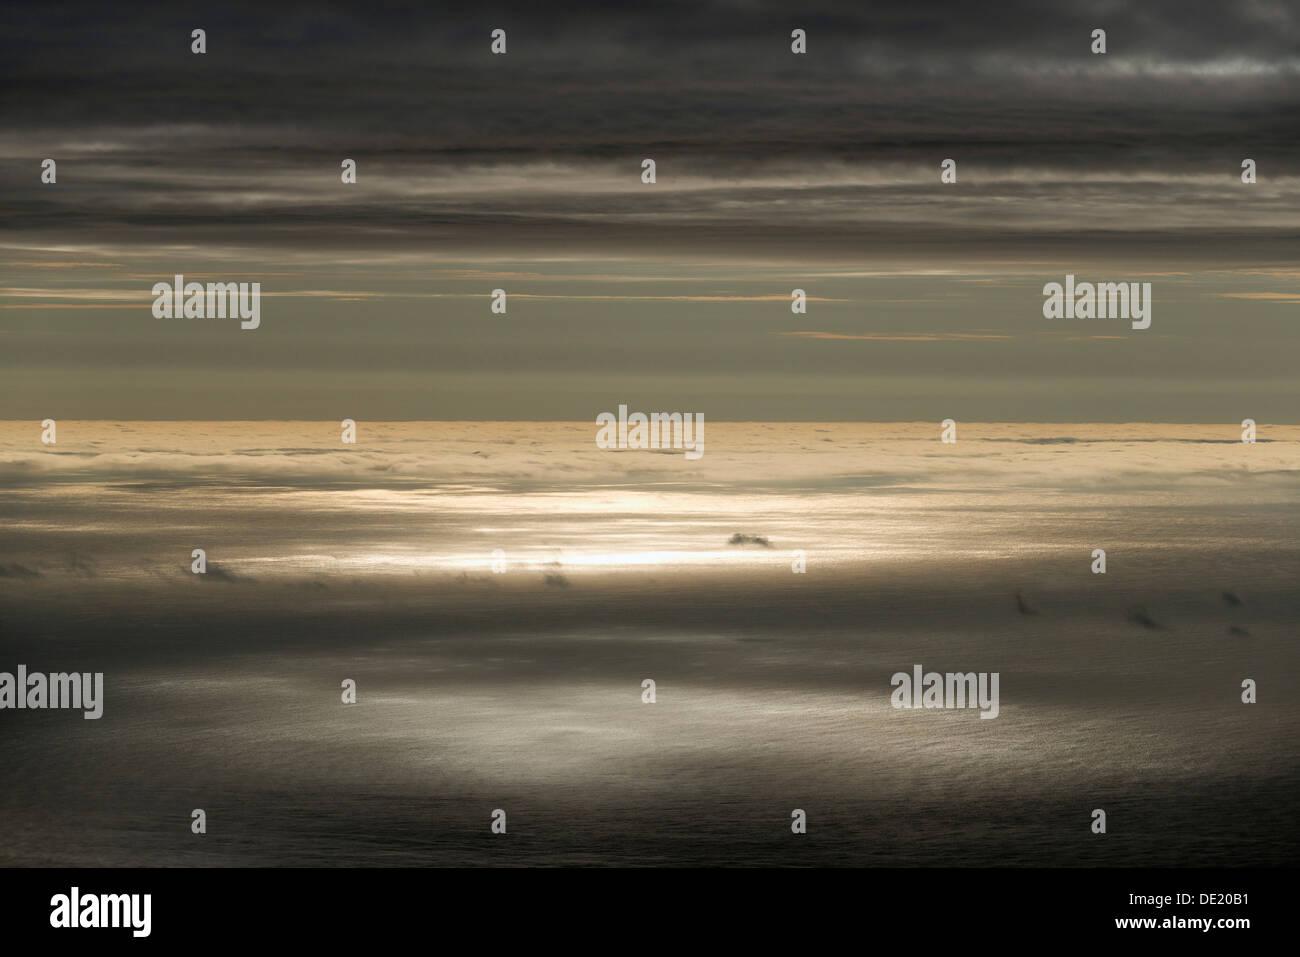 Sun reflecting on the surface of the sea, clouds, Eysturoy, Faroe Islands, Denmark - Stock Image